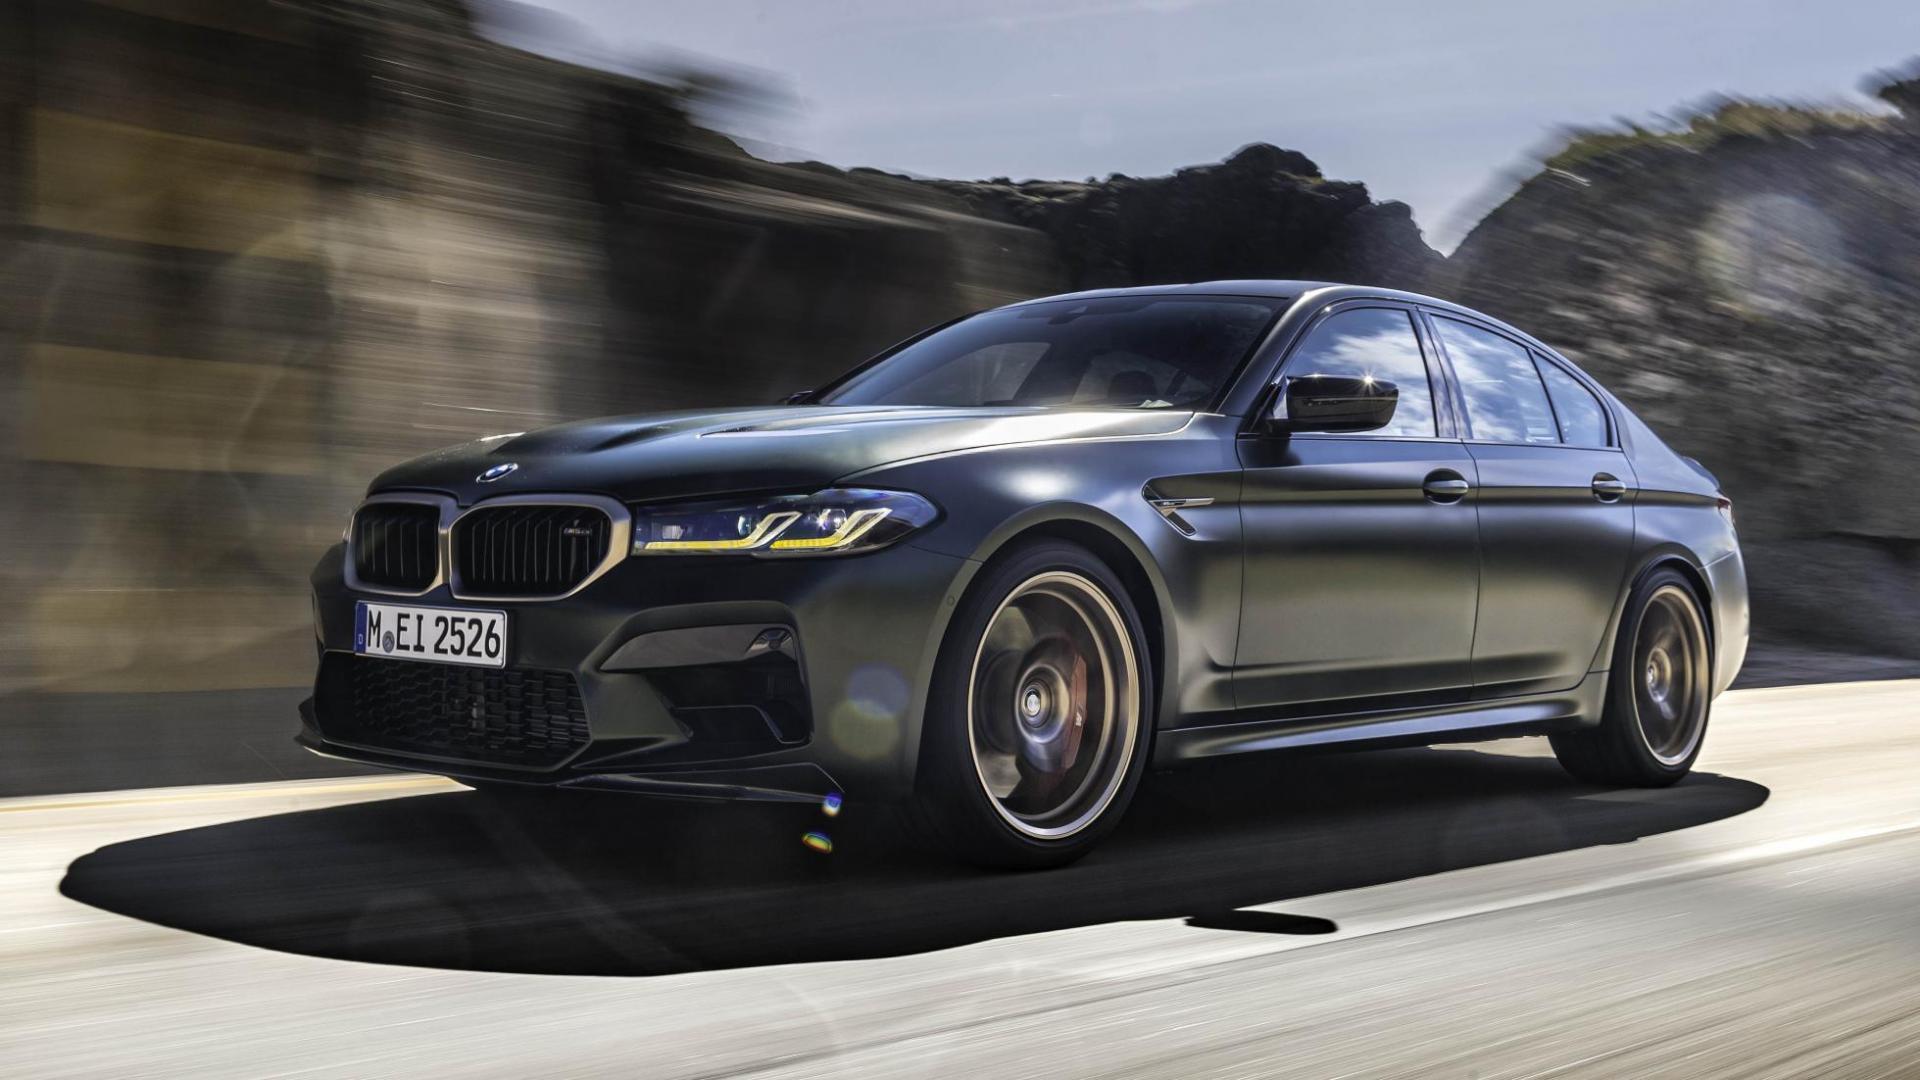 BMW M5 CS 2021 (G30)